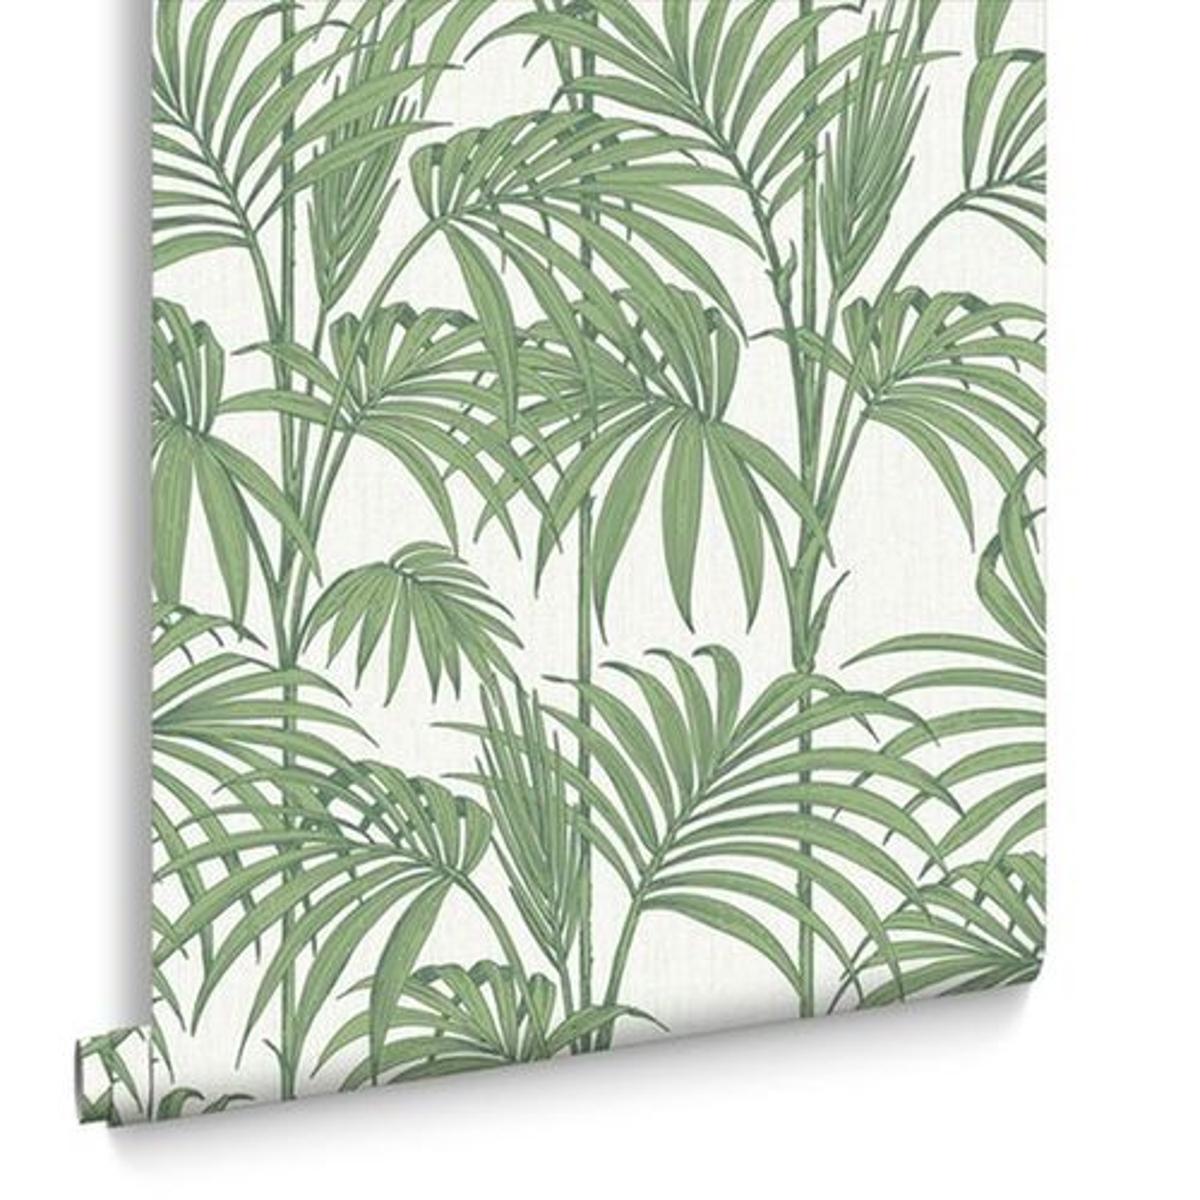 Julien Macdonald Papier Peint Support Intissé Honolulu Vinyle 1005 x 52 cm Vert & Blanc